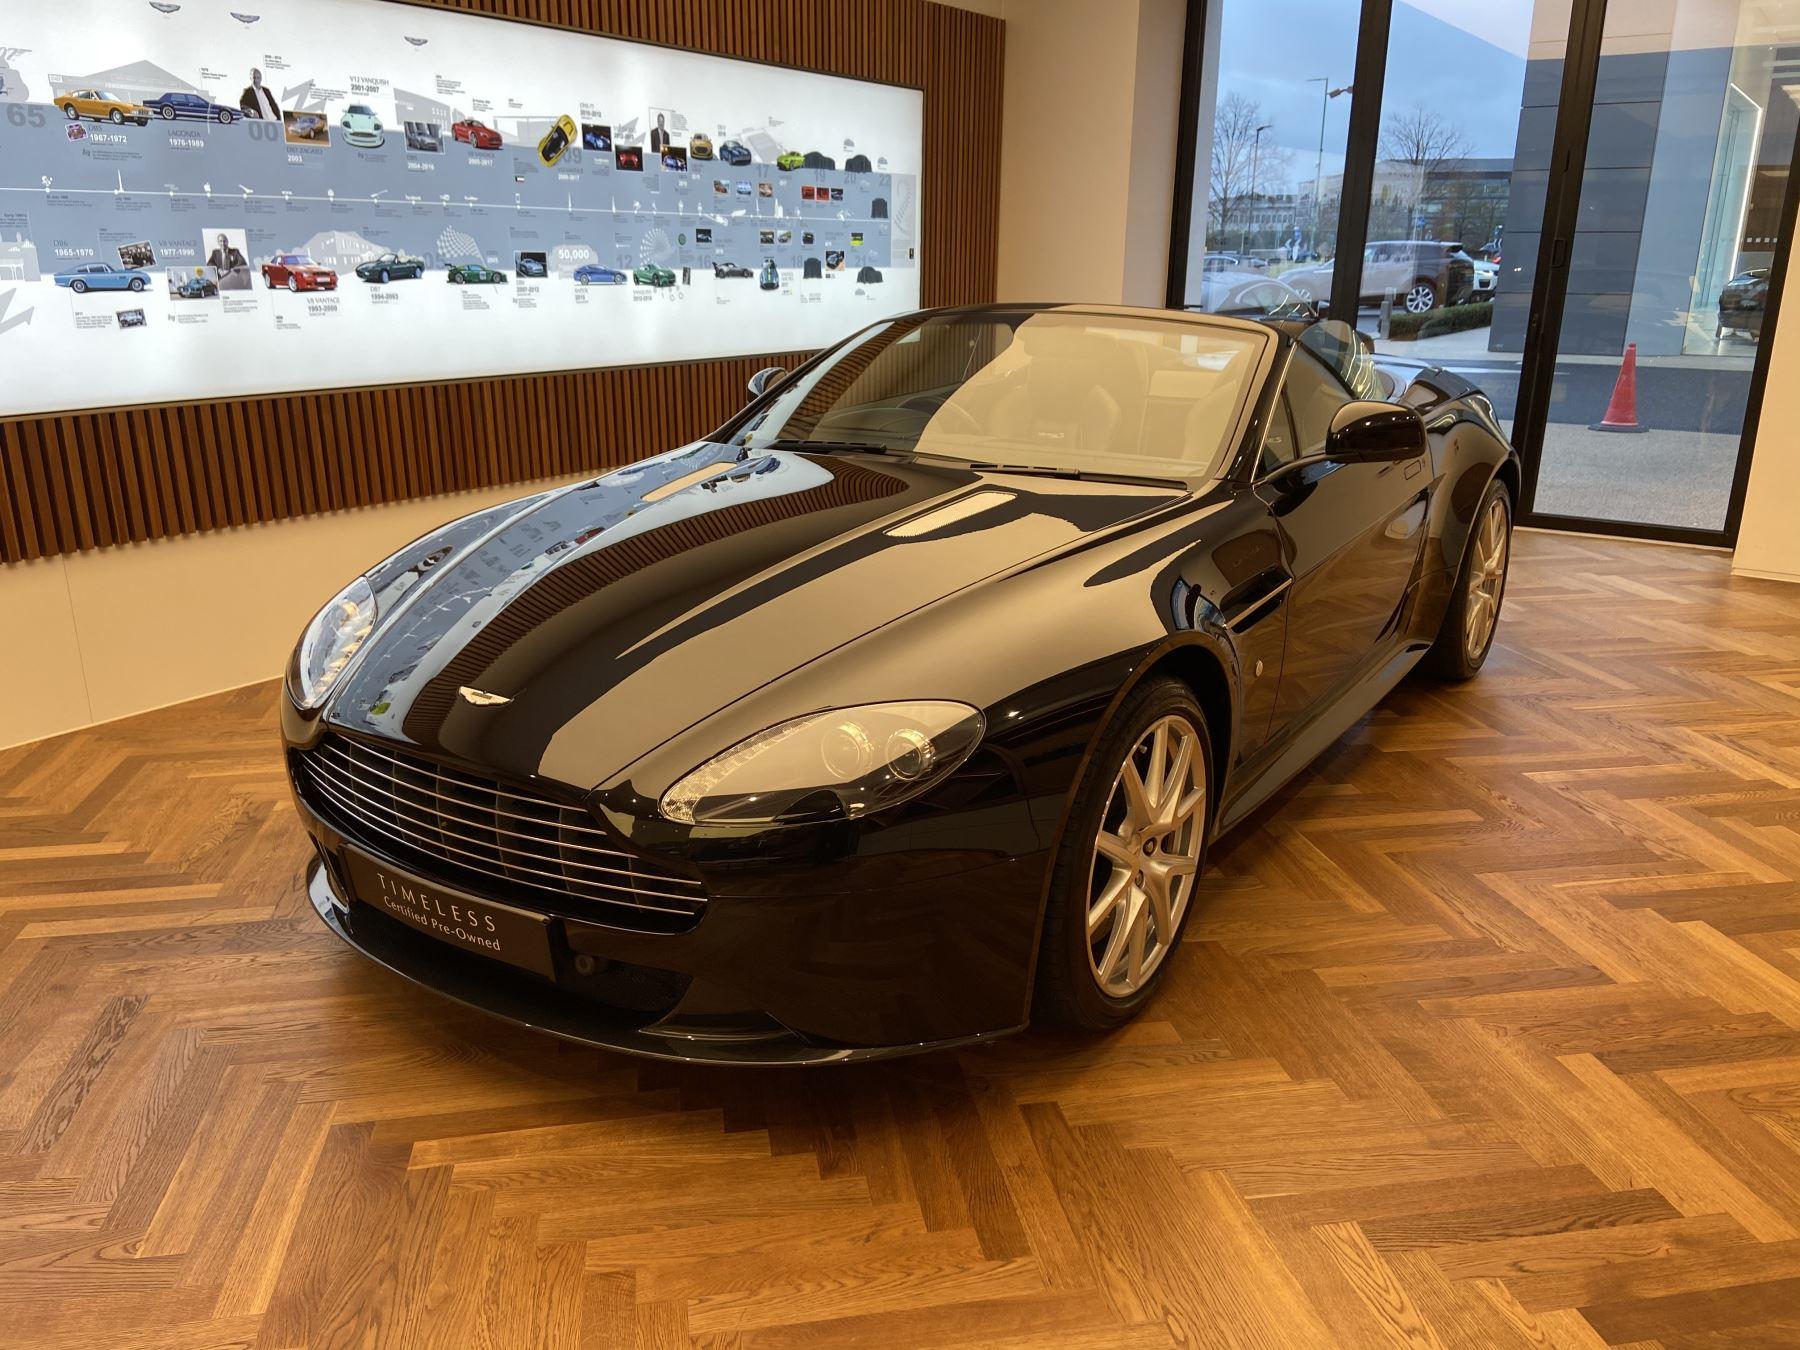 Used Aston Martin Cars For Sale Grange